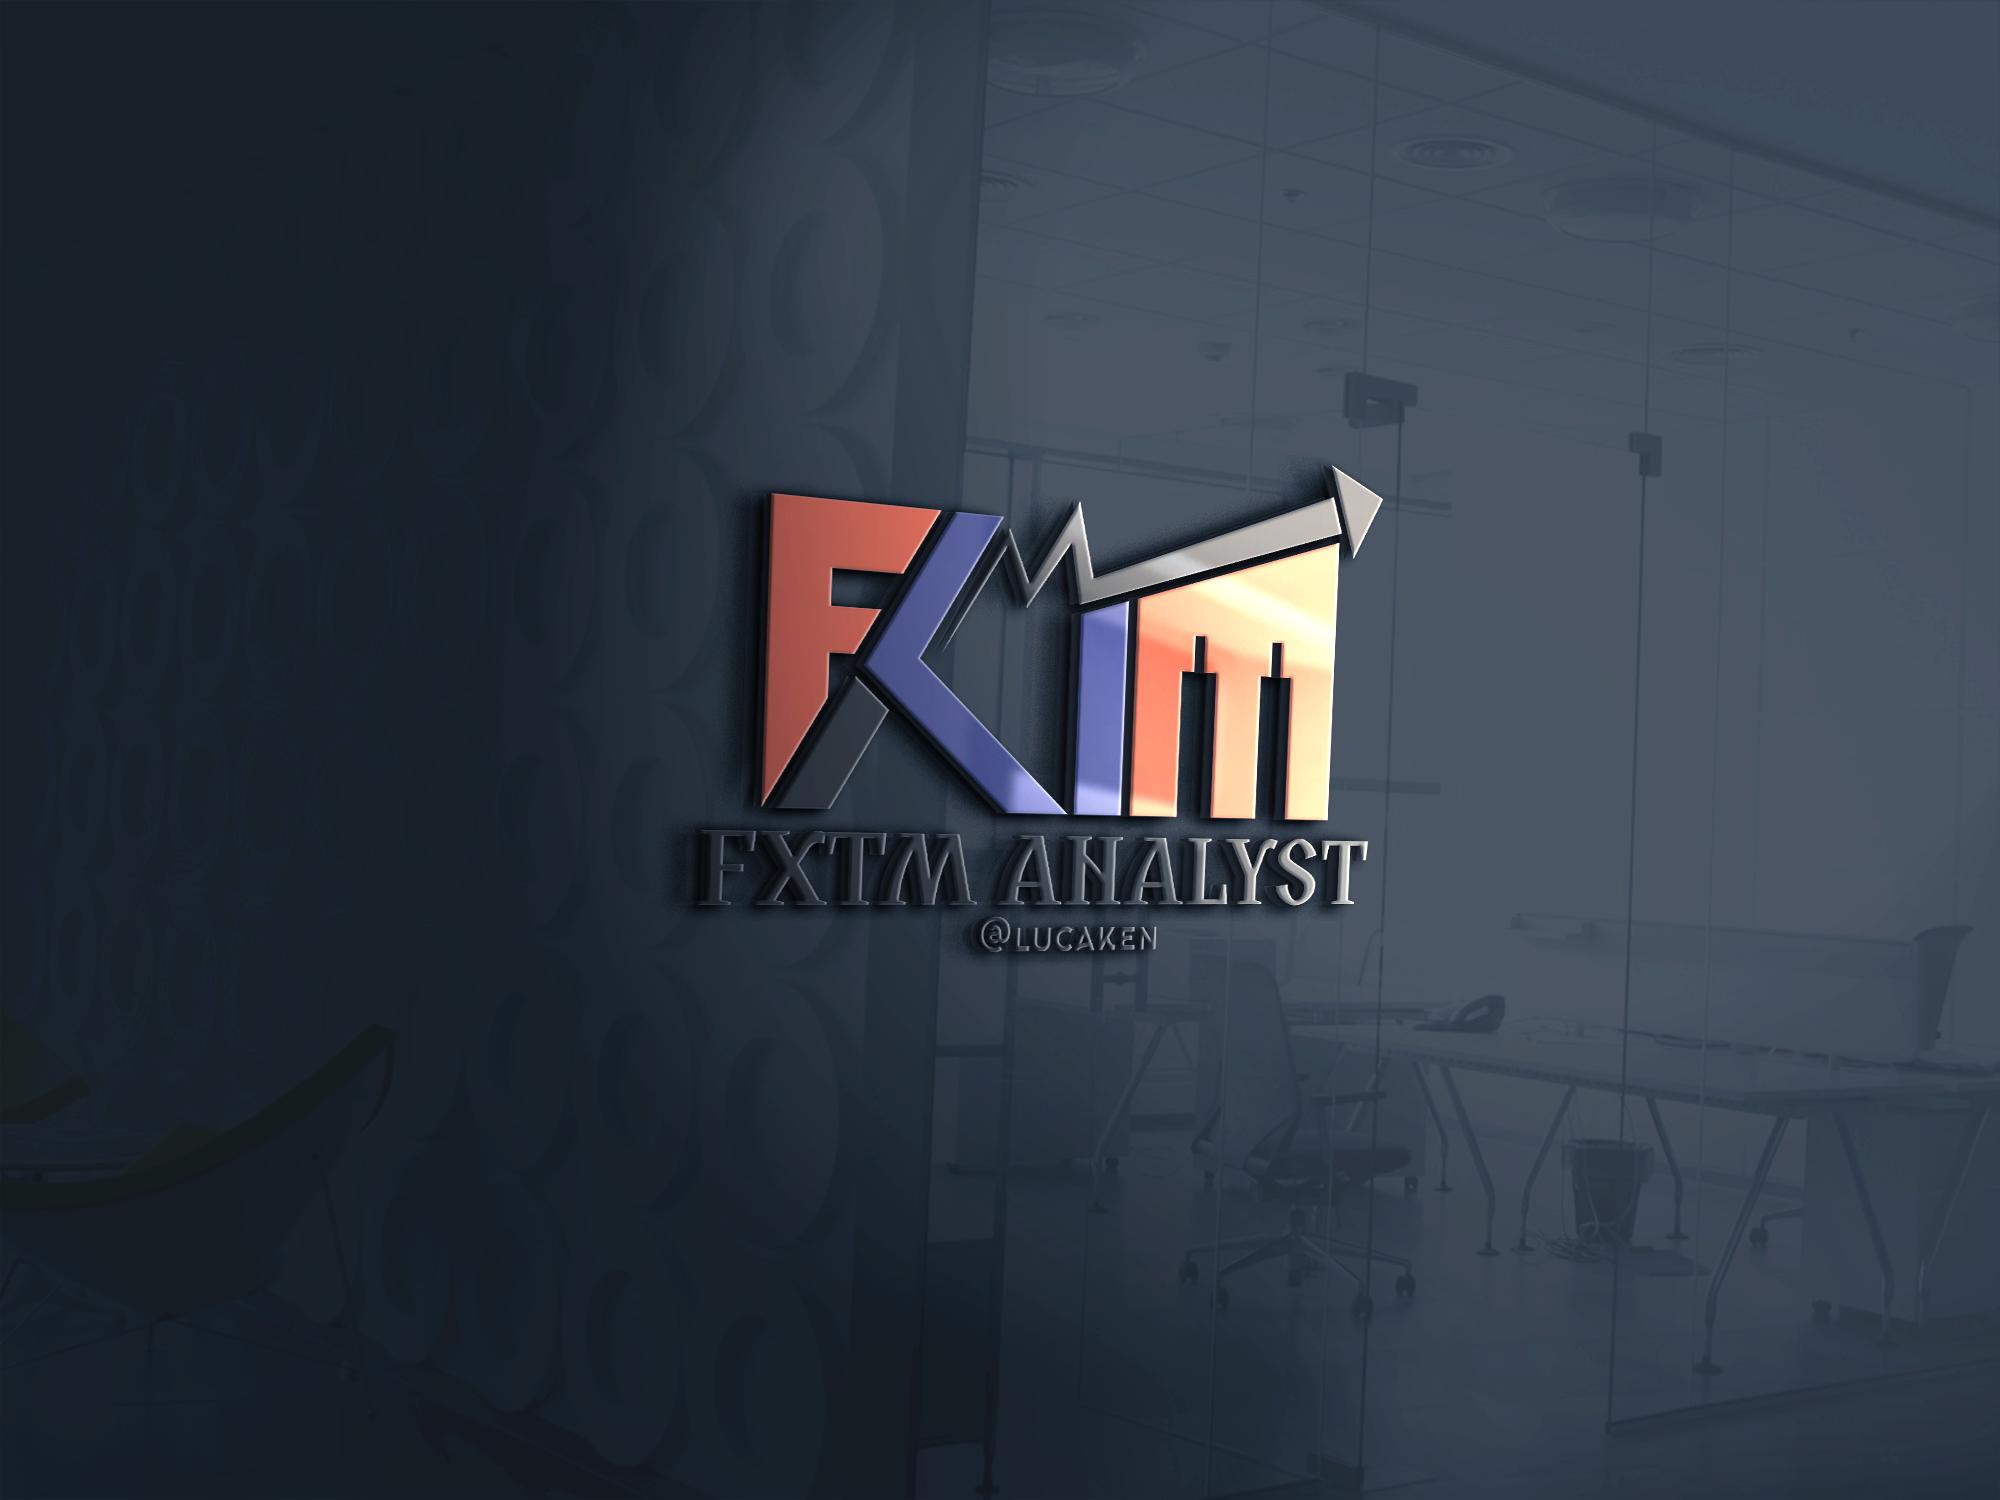 Design Minimalist Business Logo